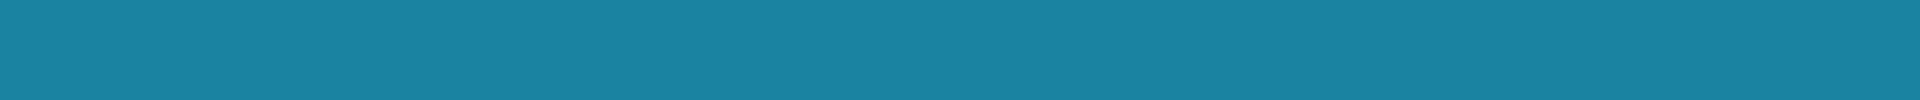 banner_CF_blu